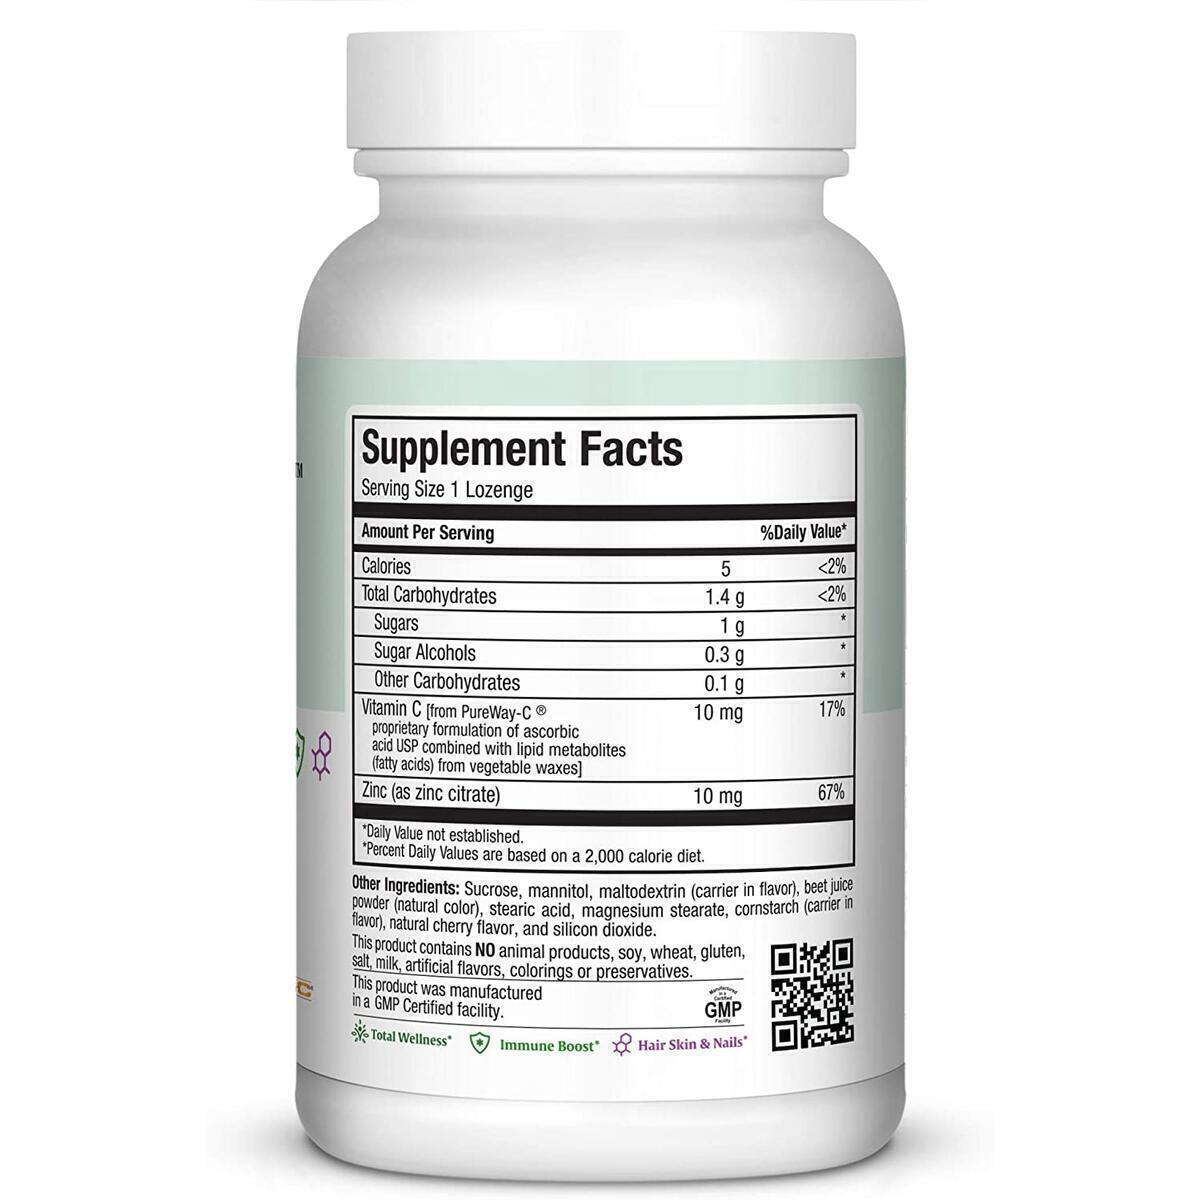 Zinc Lozenges - Zinc Citrate 10mg - with Vitamin C - Cherry Flavor